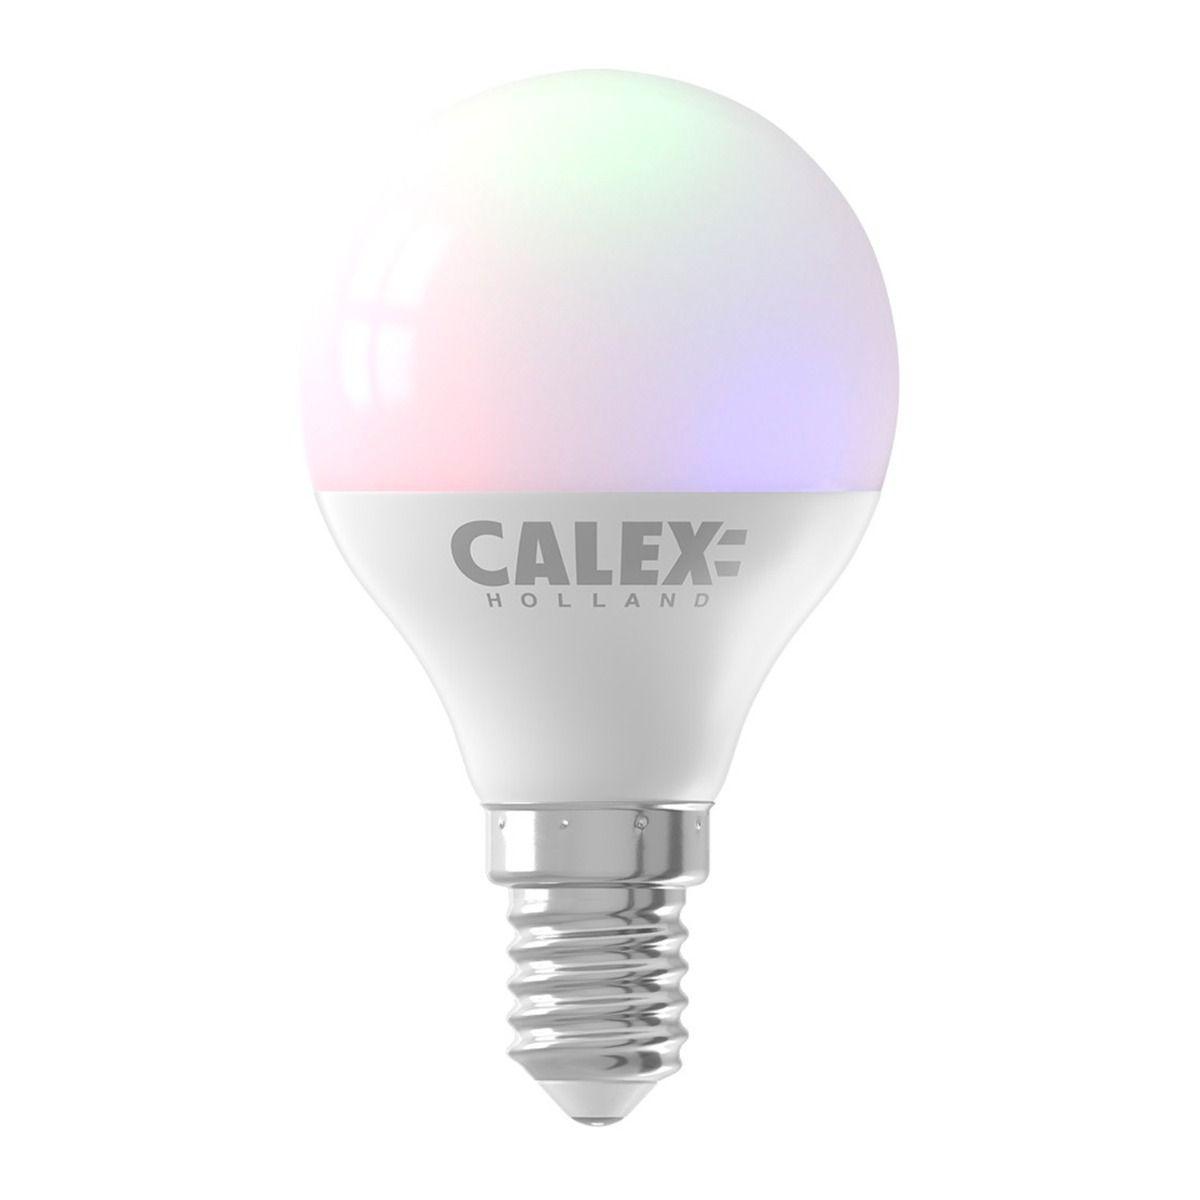 Calex Smart Kugelförmig LED Glühbirne E14 5W 470lm 2200-4000K | Tuya Wifi